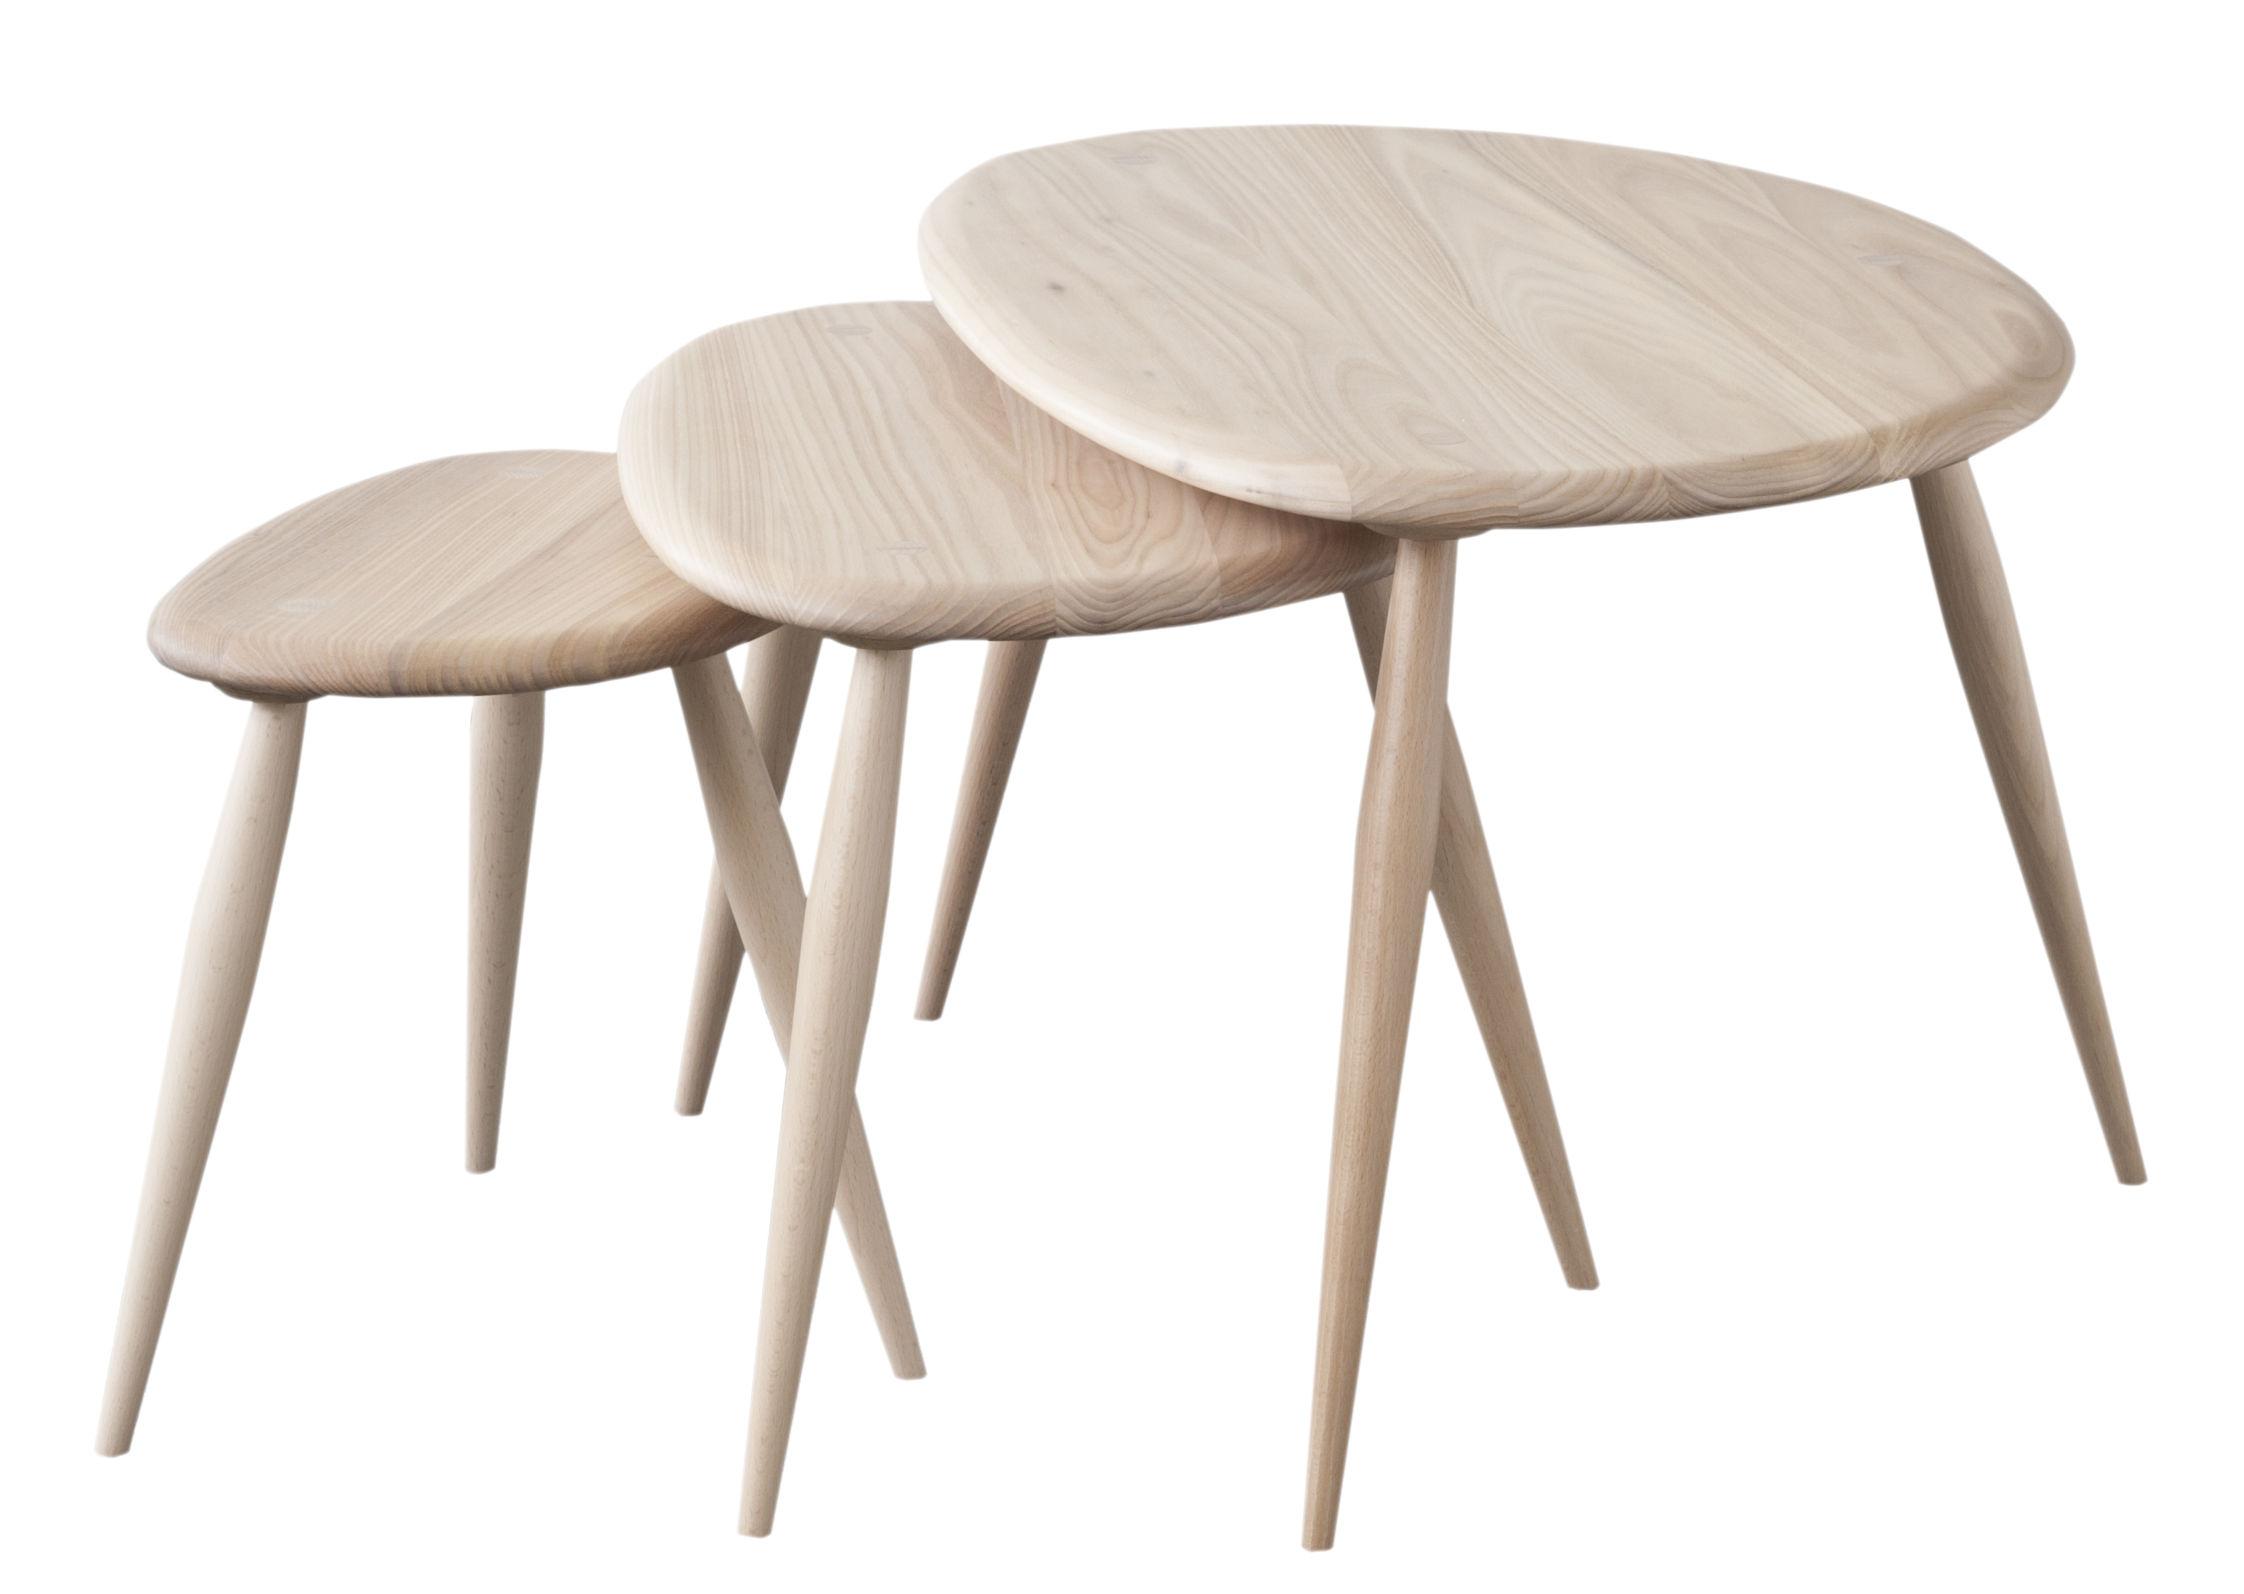 Scopri tavolini estraibili originals set 3 tavoli for Table th means